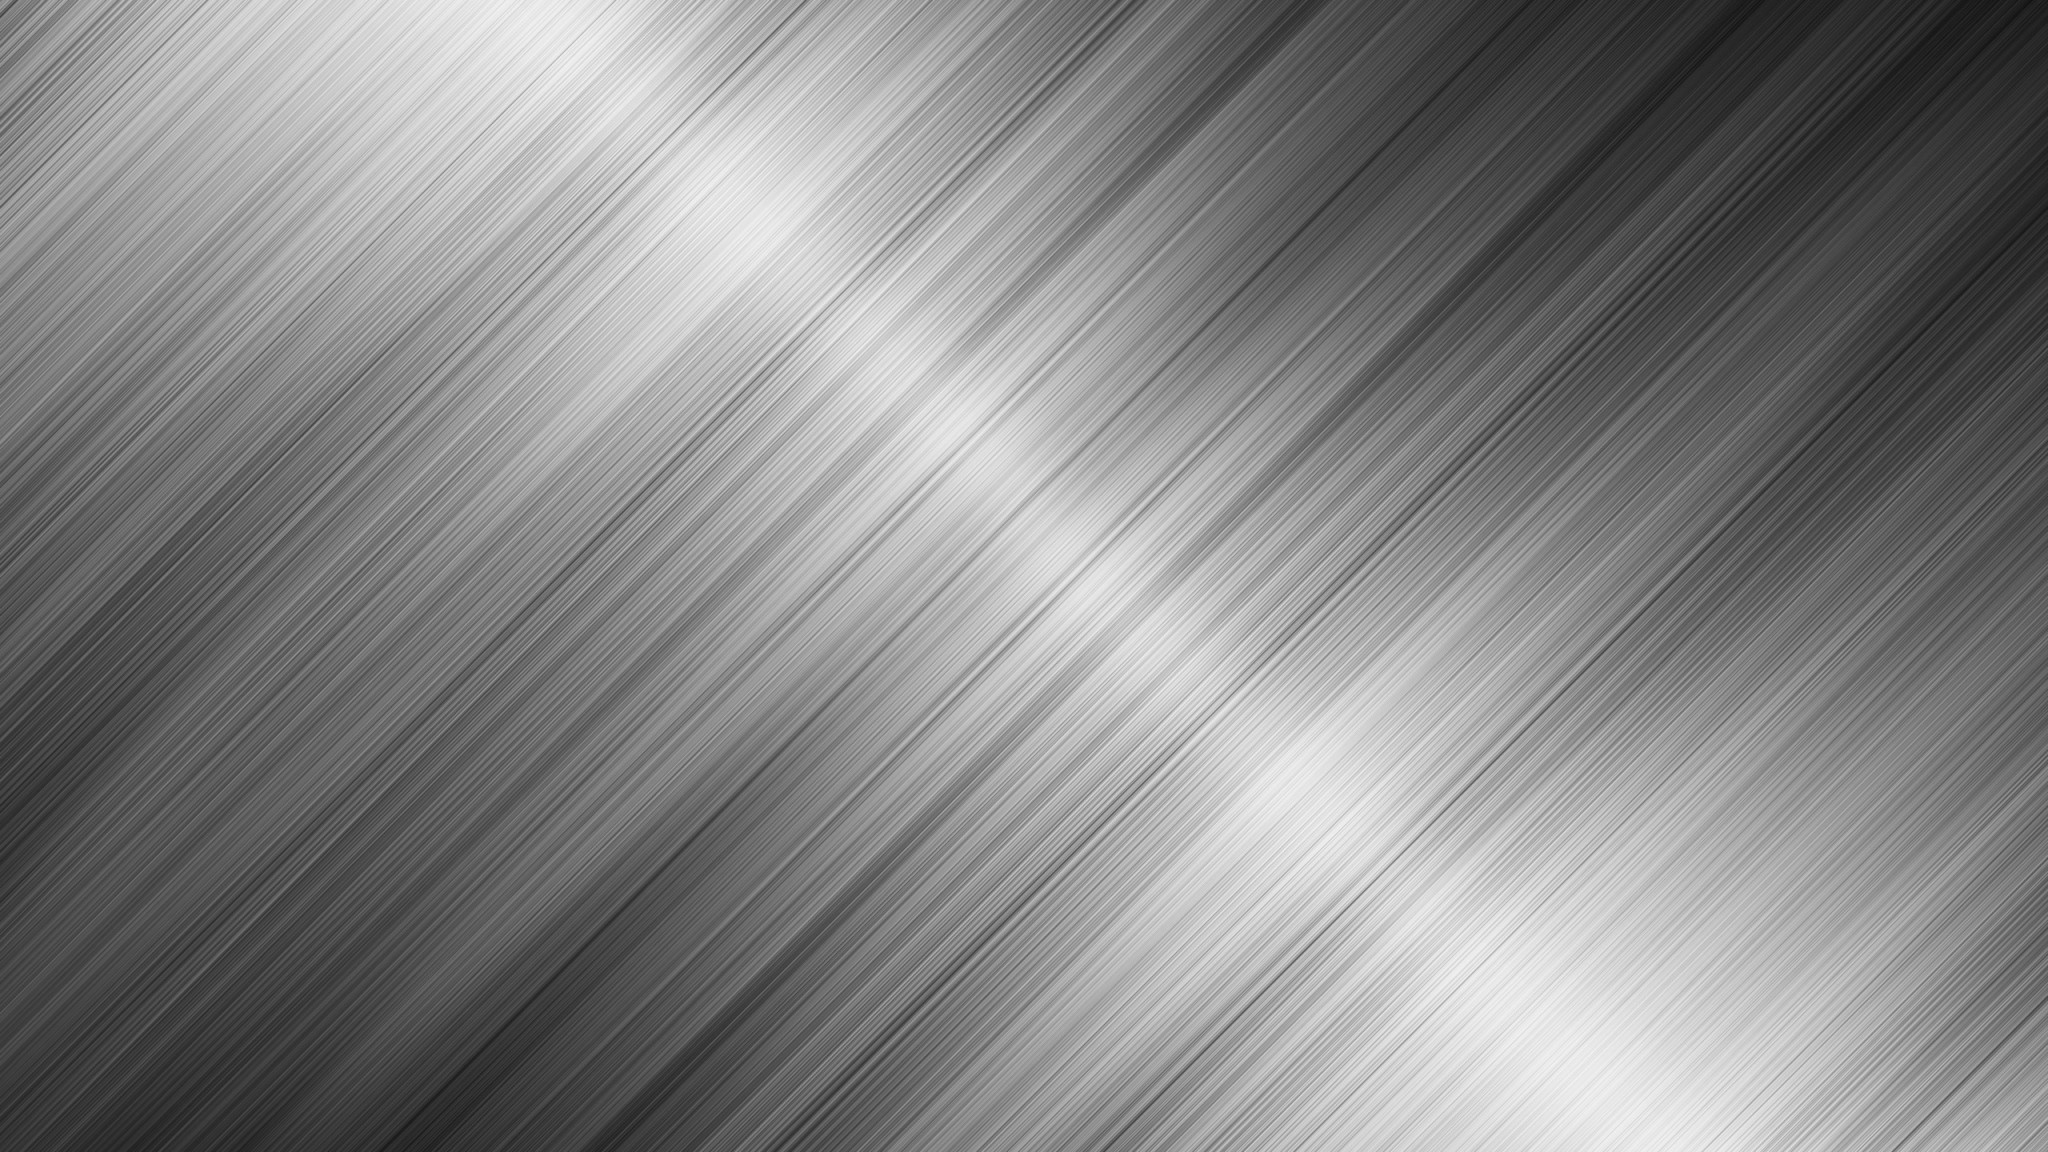 Preview wallpaper metal, lines, stripes, light, shiny, silver 2048×1152